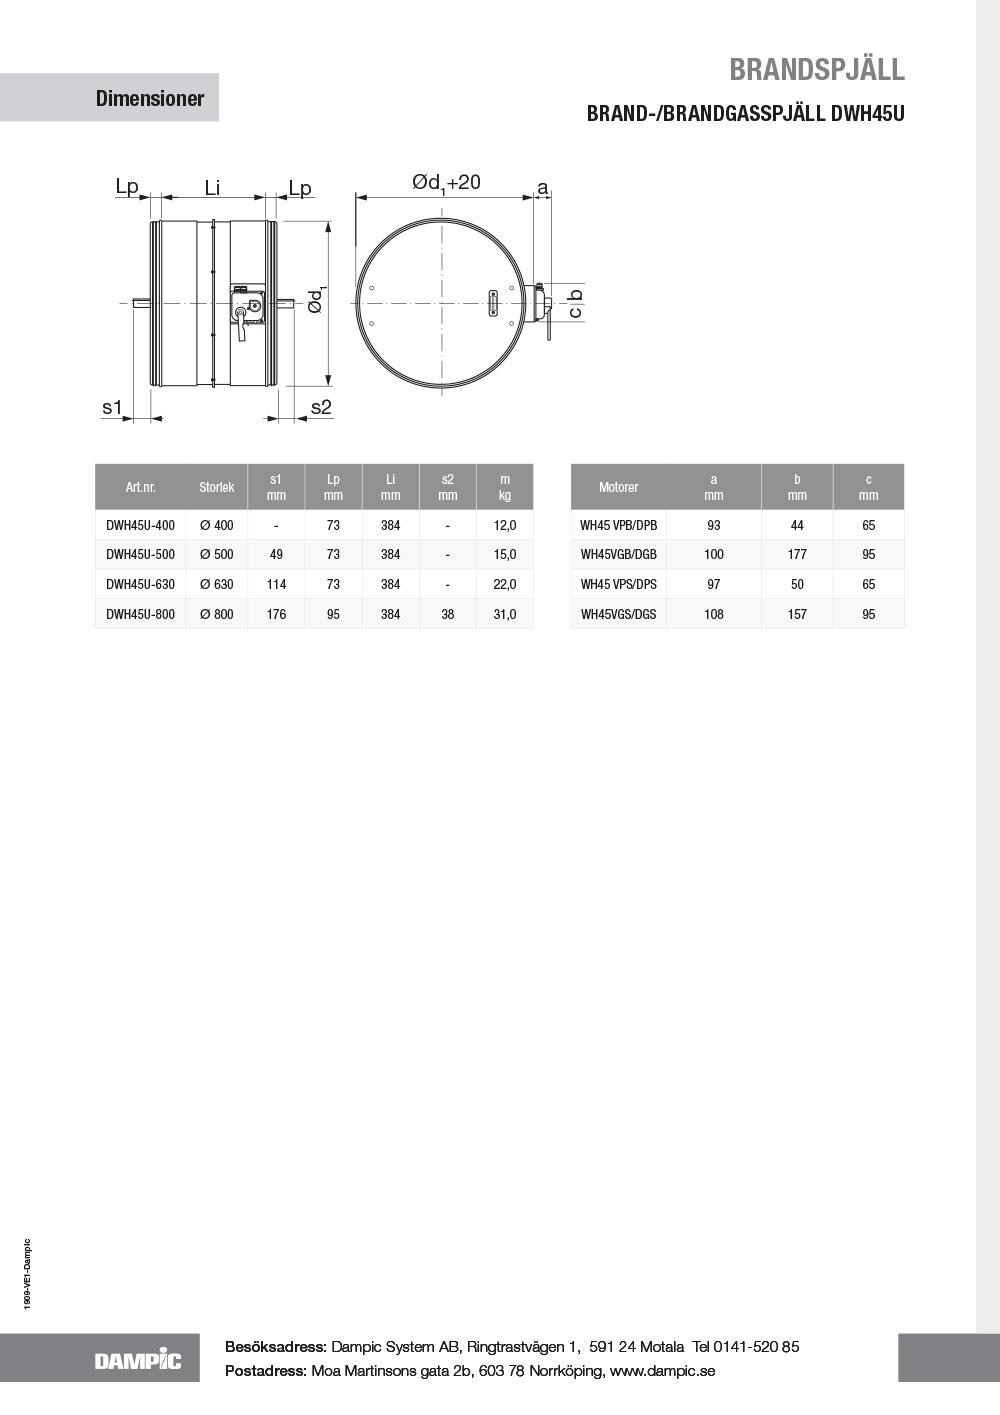 Brand-/brandgasspjäl DWH45U